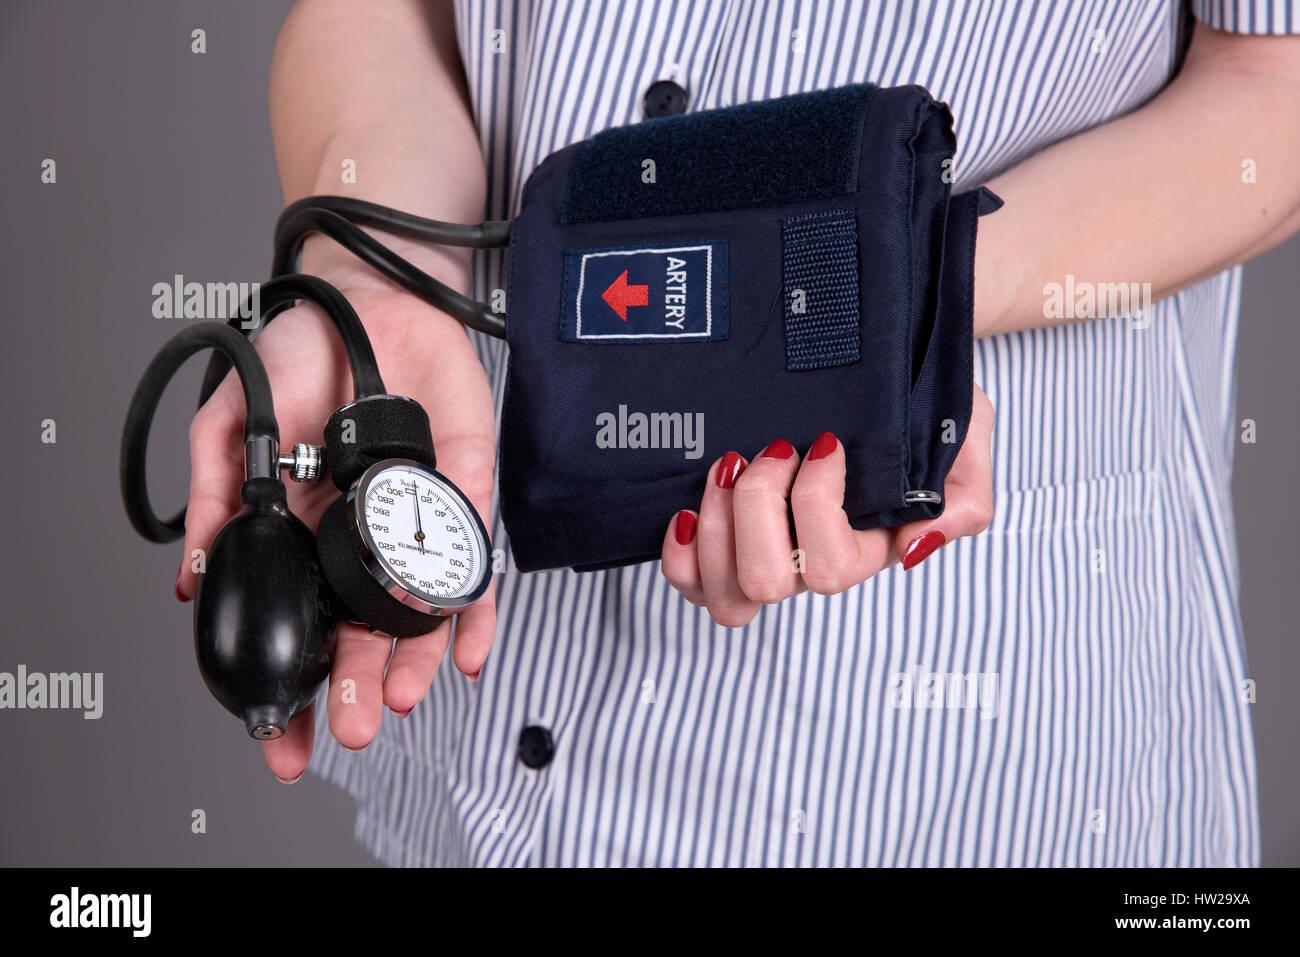 Nurse holding blood pressure measuring kit - Stock Image